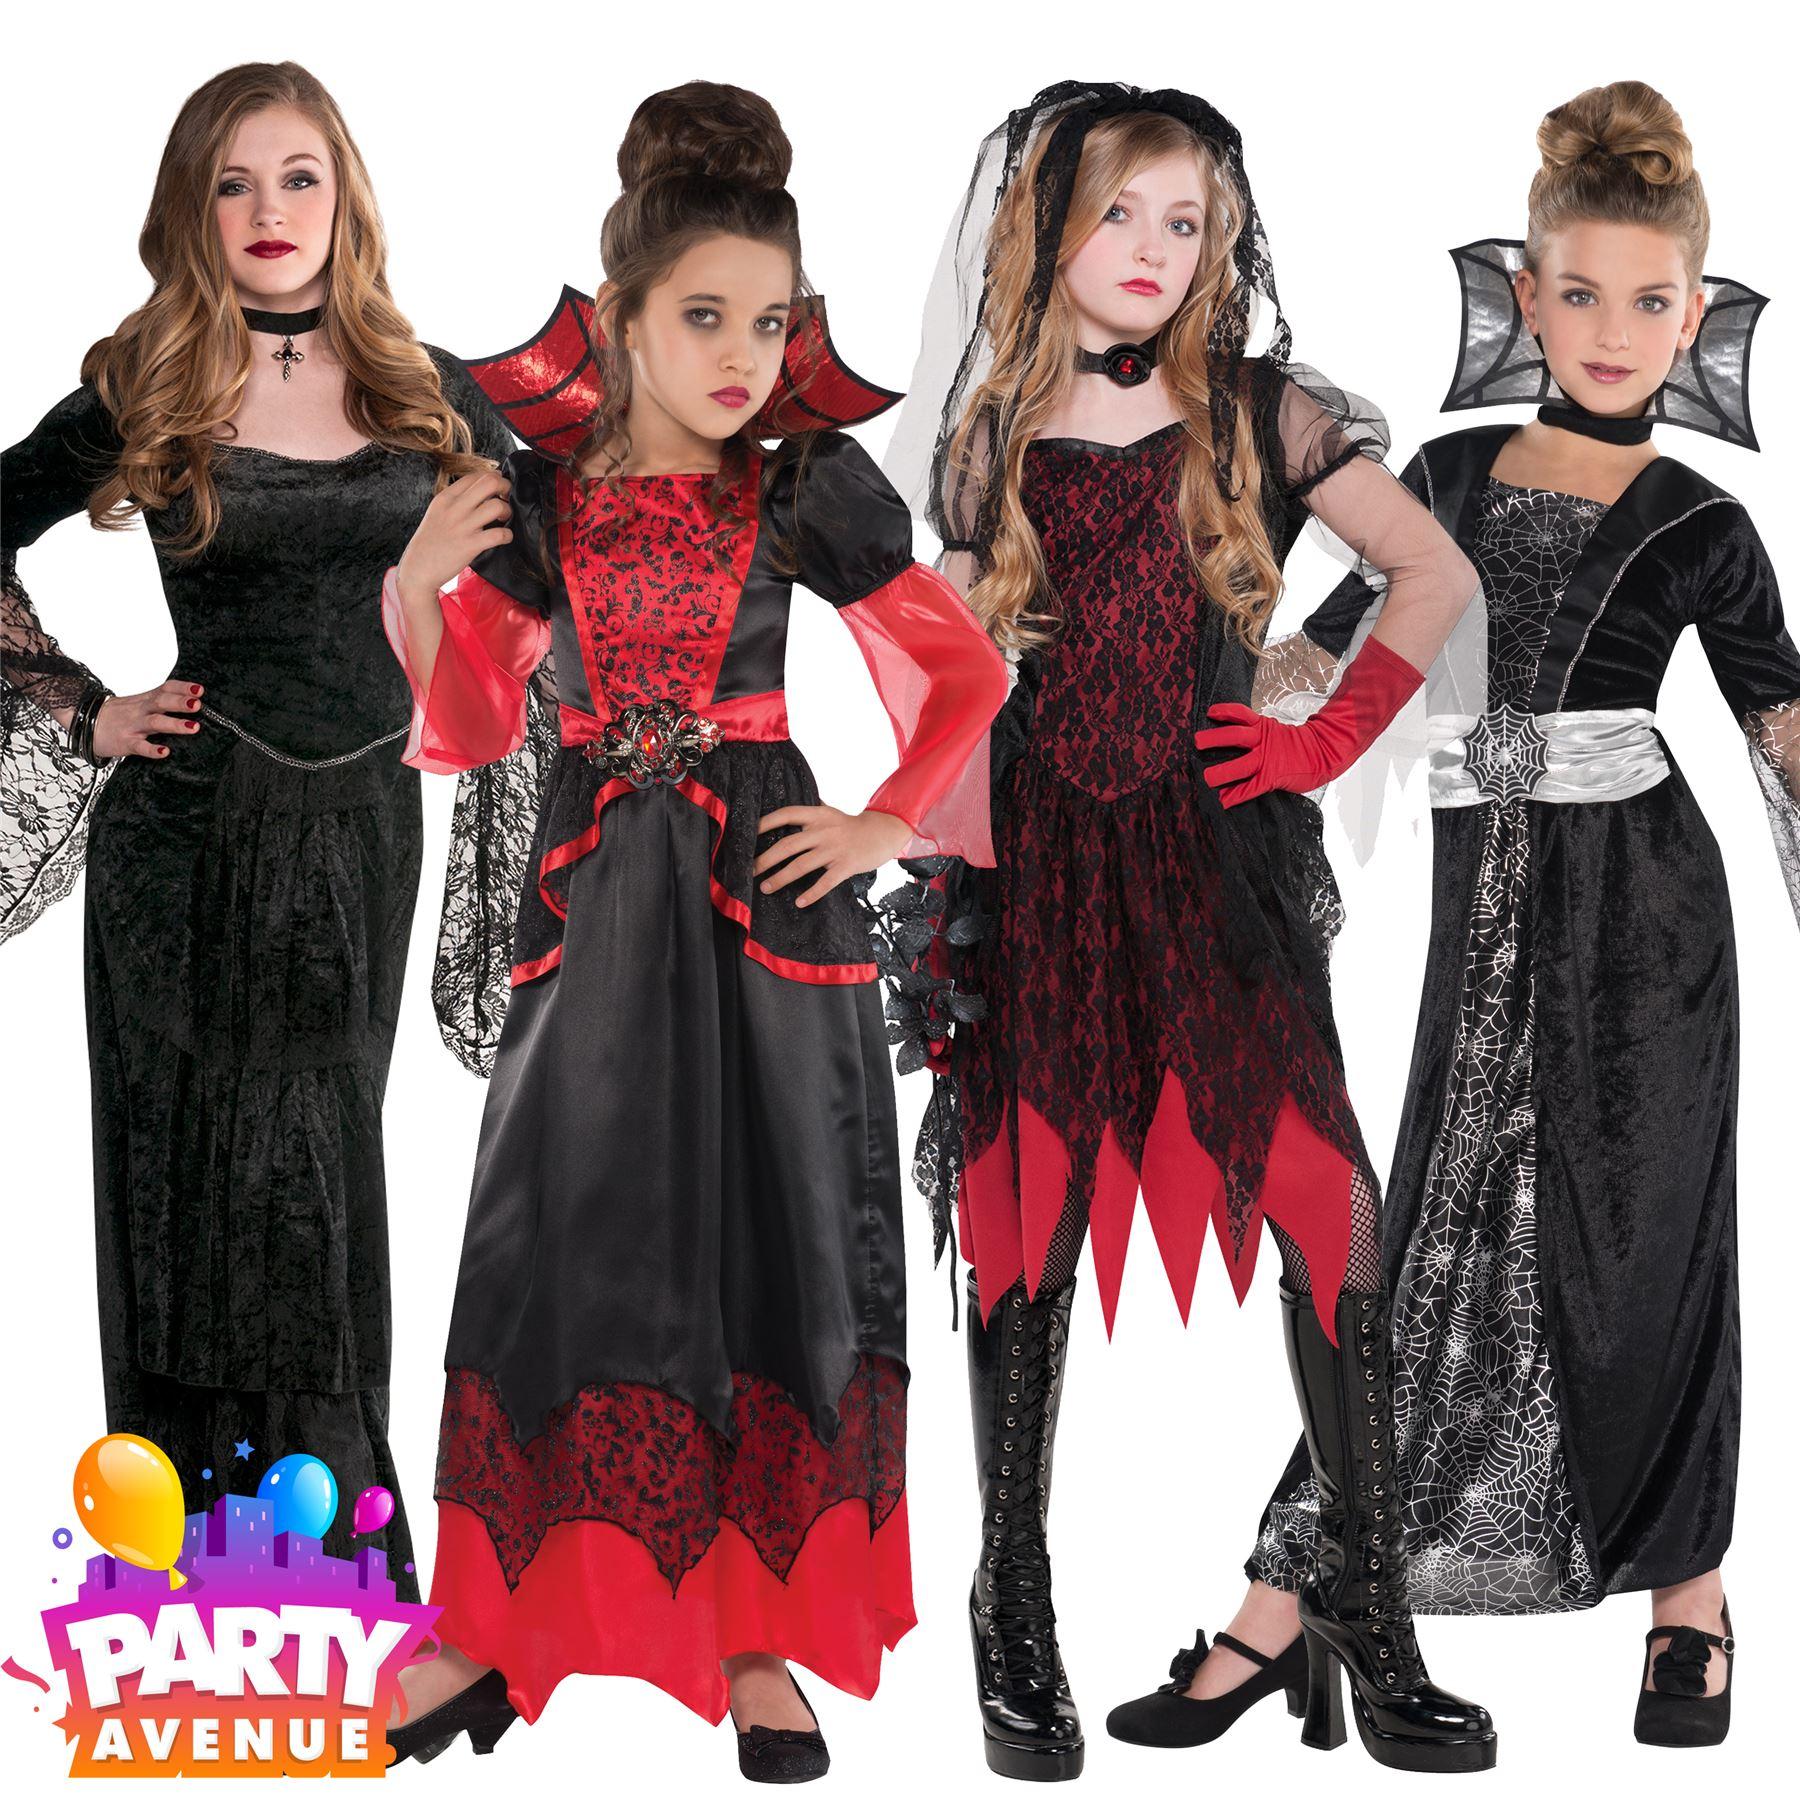 Pity, costume goth halloween teen